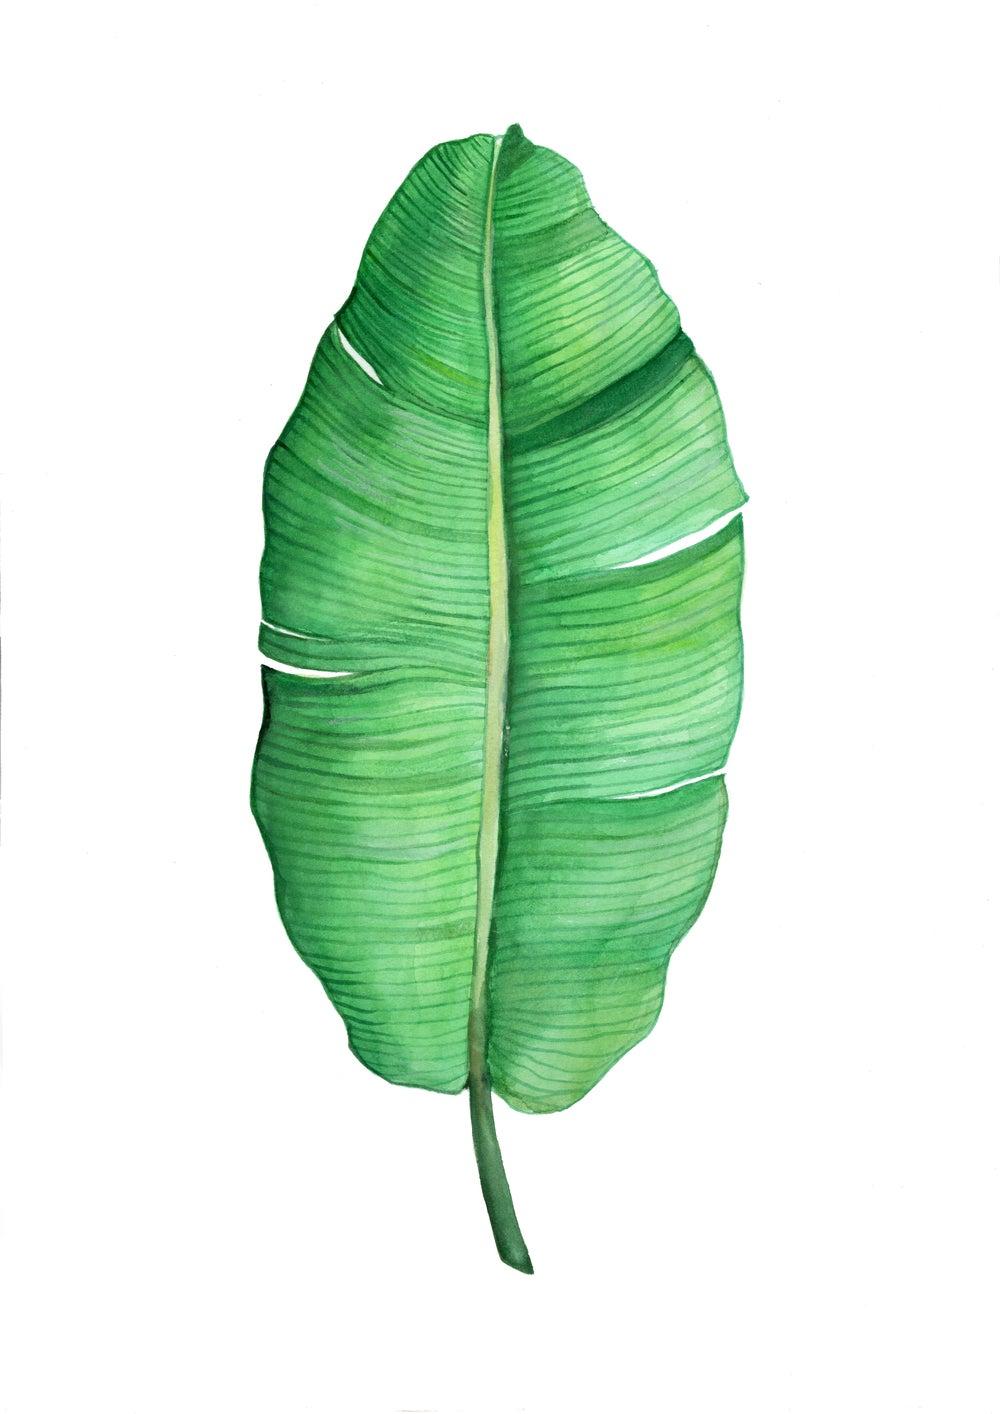 Image of Banana Leaf